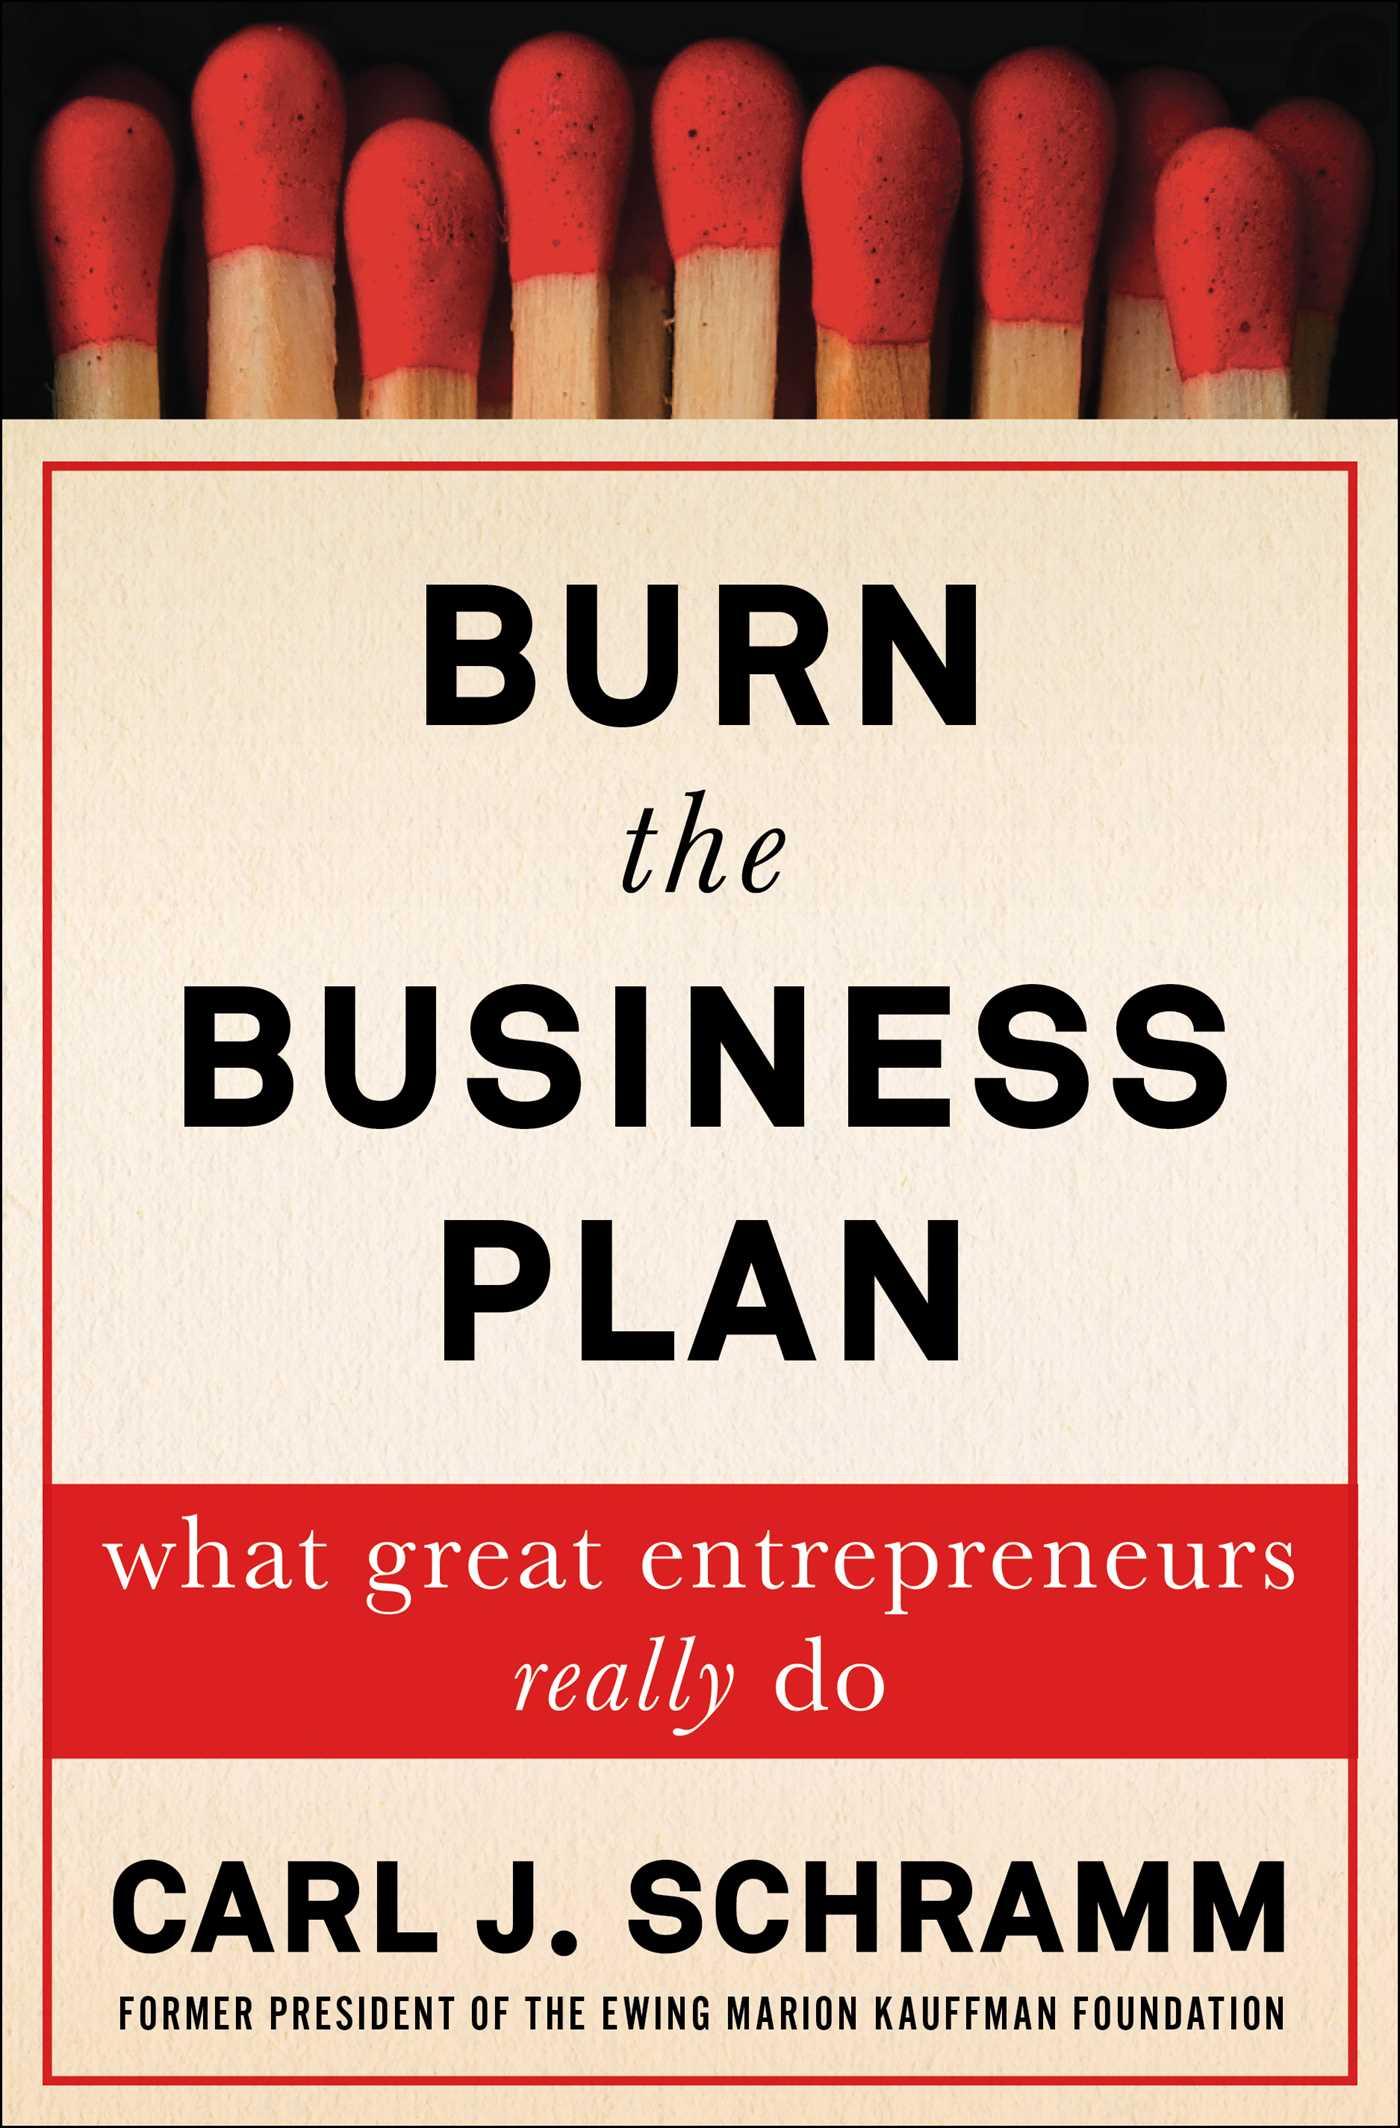 Burn the business plan 9781476794358 hr